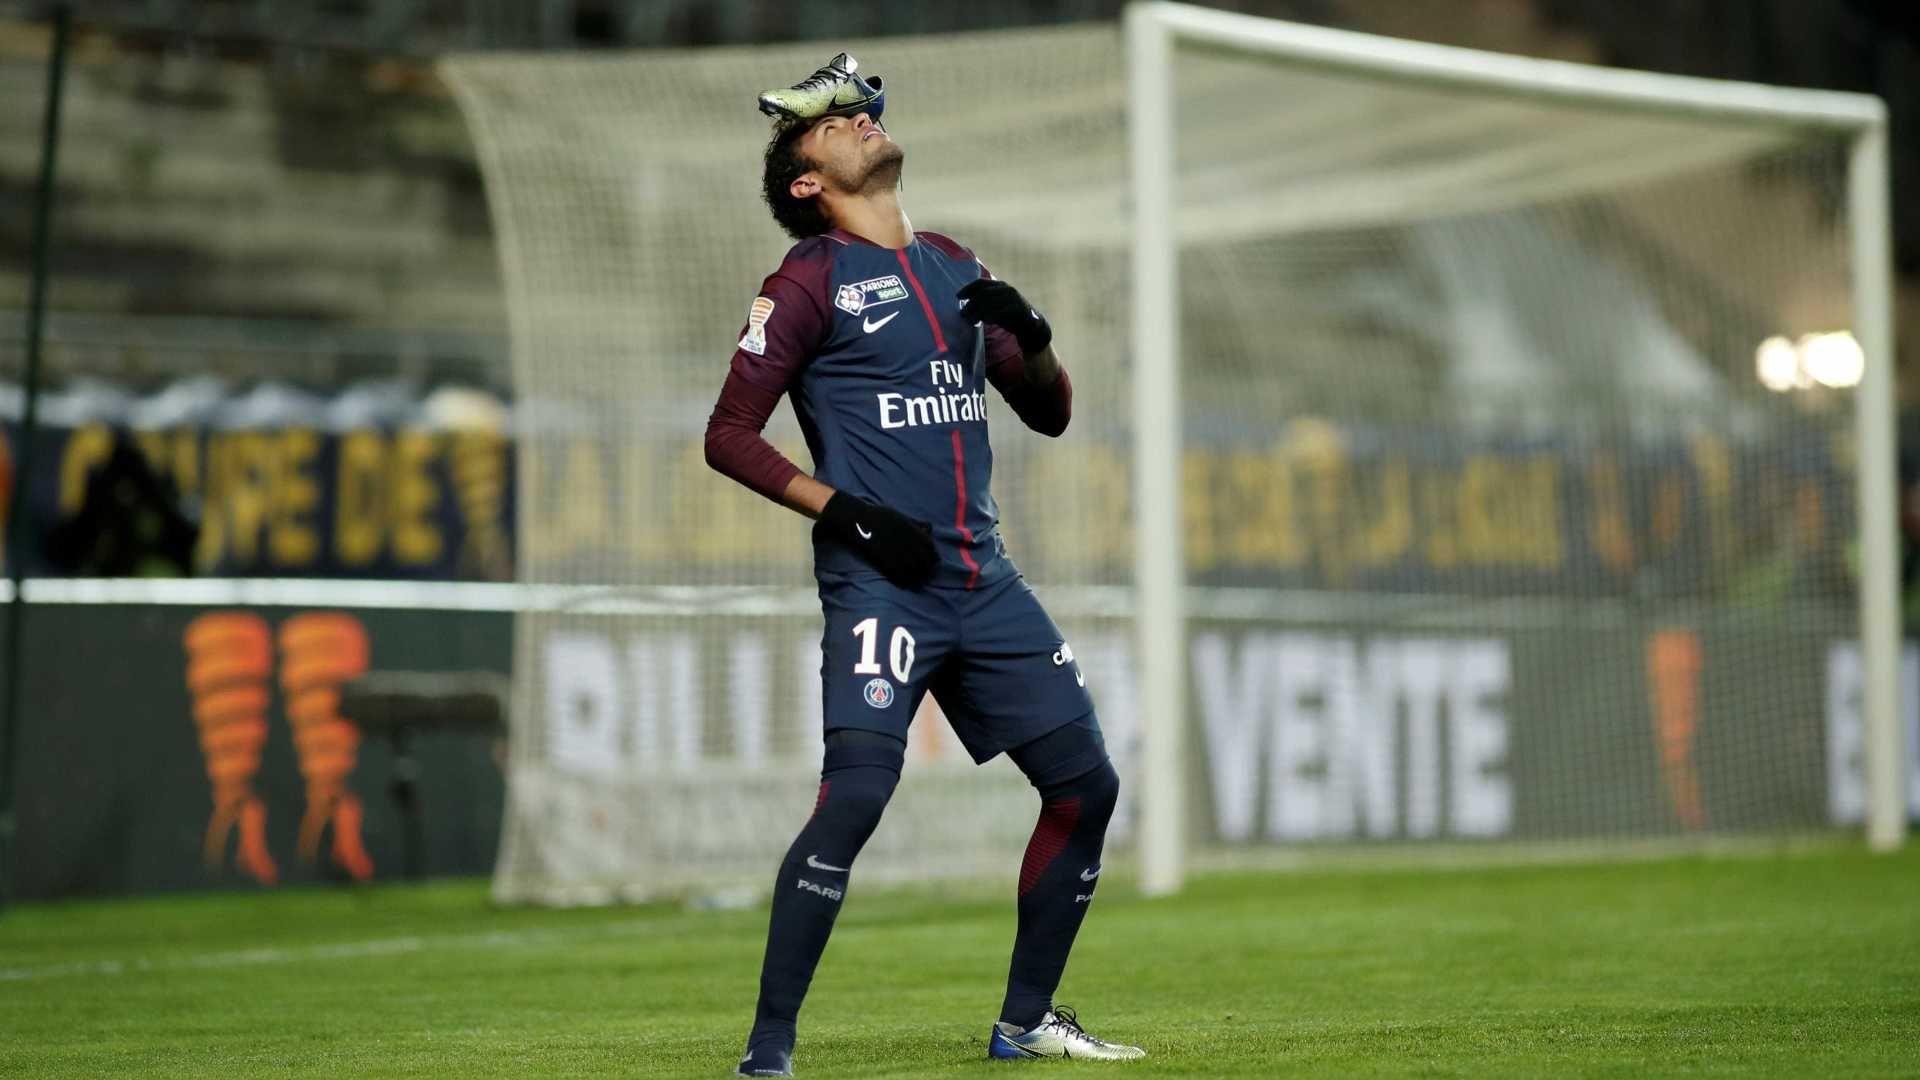 Pin by Candido Daniel on Desporto Neymar, French league, Psg